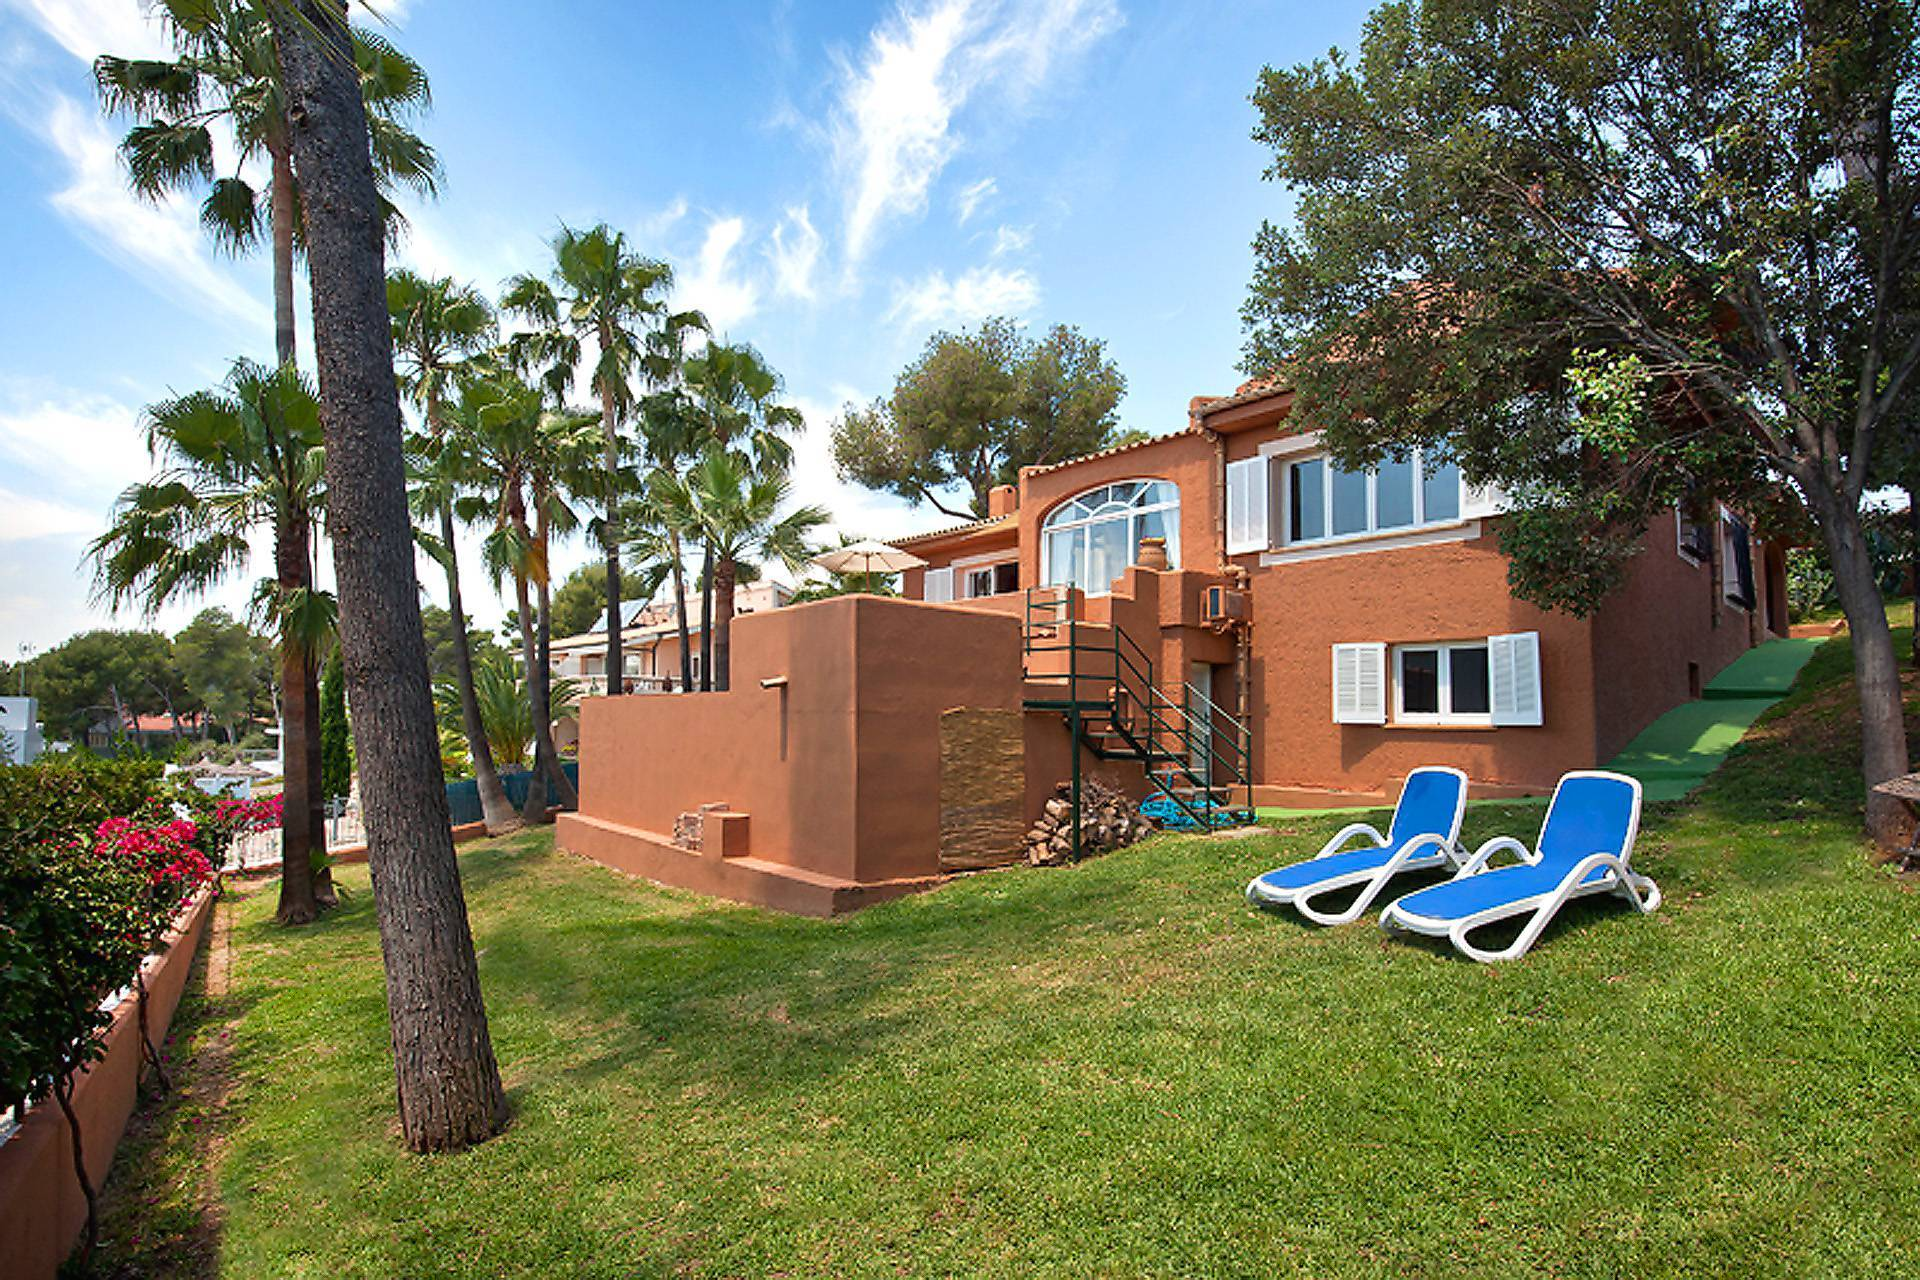 01-228 Mediterrane Villa Mallorca Norden Bild 3